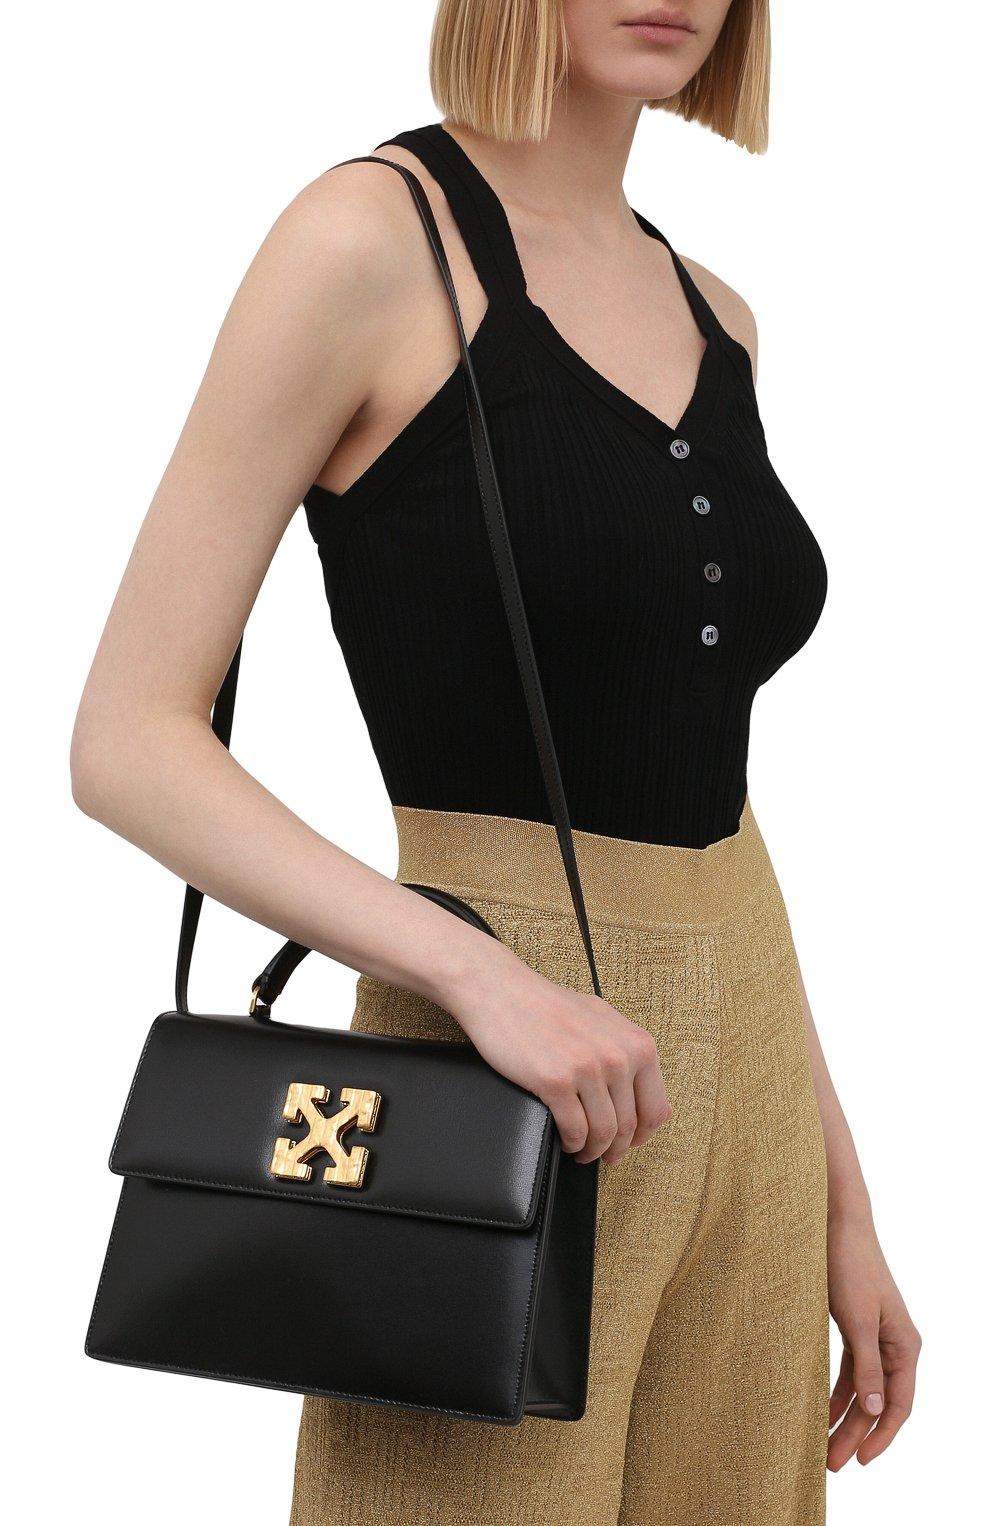 Женская сумка 2.8 jitney OFF-WHITE черного цвета, арт. 0WNP002S21LEA001 | Фото 5 (Сумки-технические: Сумки через плечо, Сумки top-handle; Материал: Натуральная кожа; Ремень/цепочка: На ремешке; Размер: small)